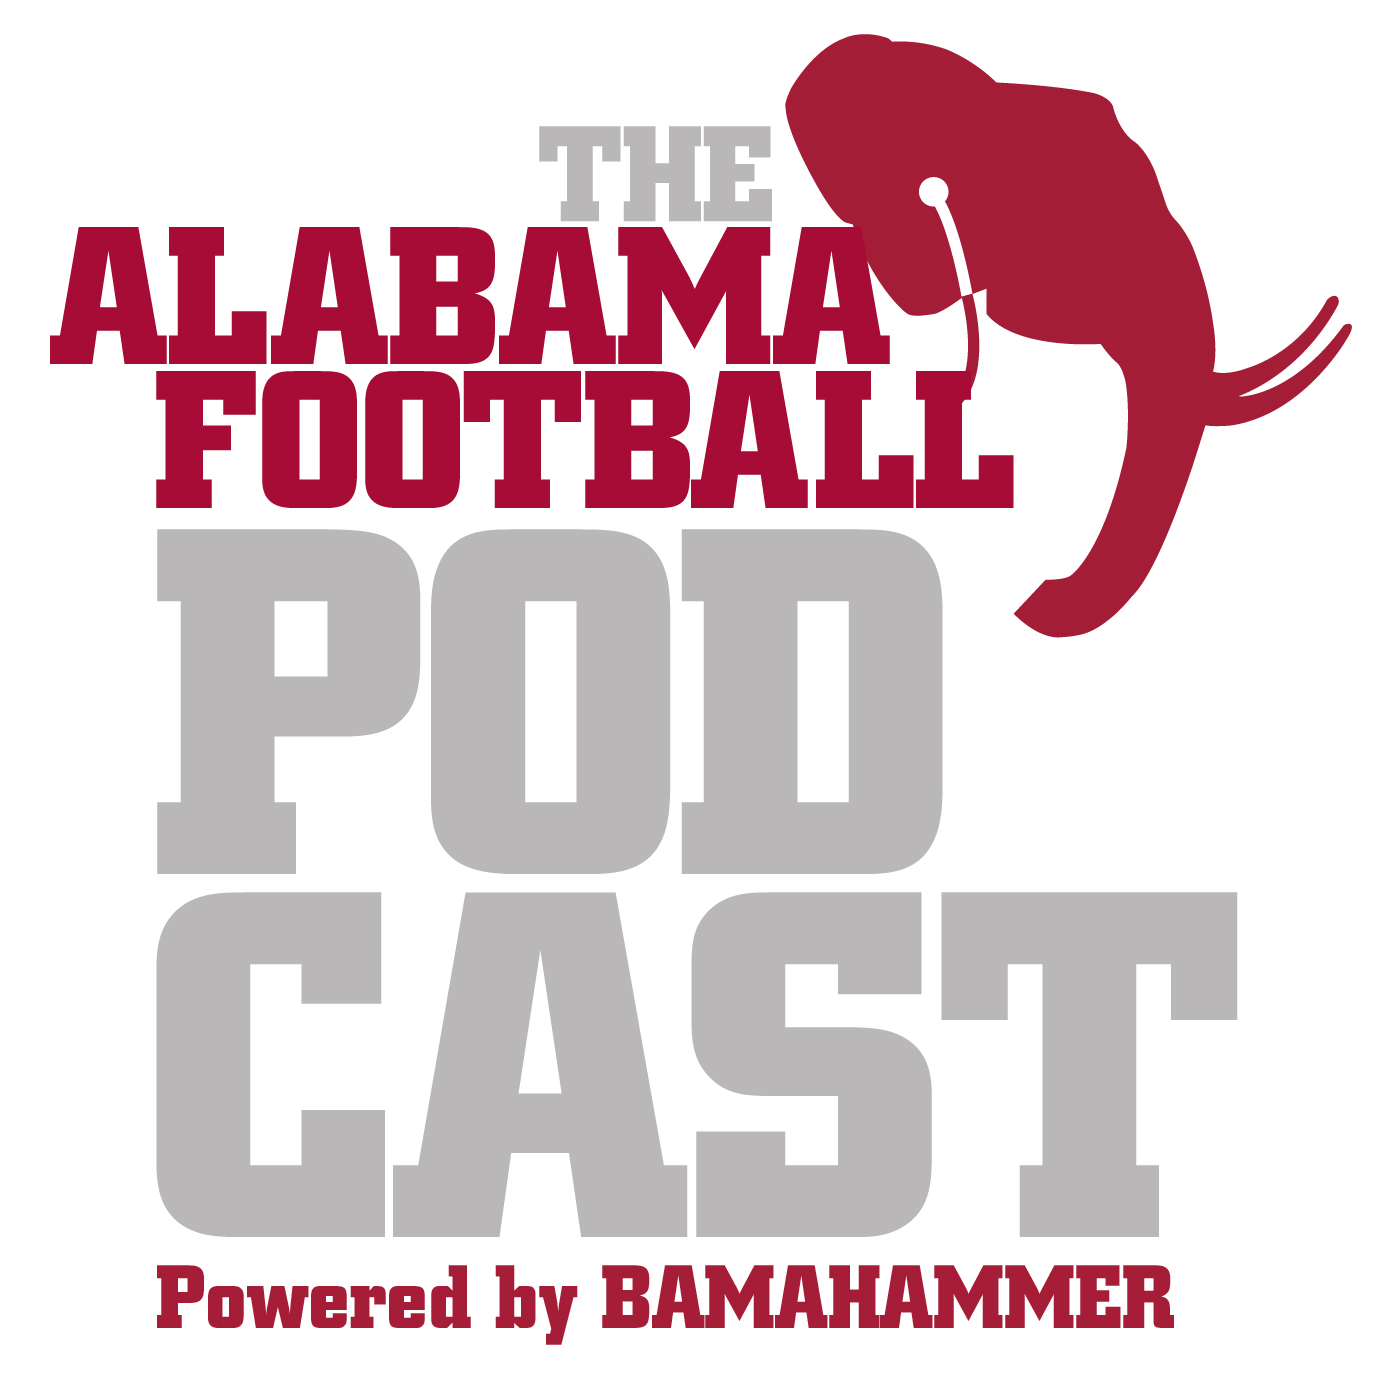 Alabama Football Podcast College Football Talk Dedicated To The University Of Alabama Crimson Tide Listen Via Stitcher For Podcasts